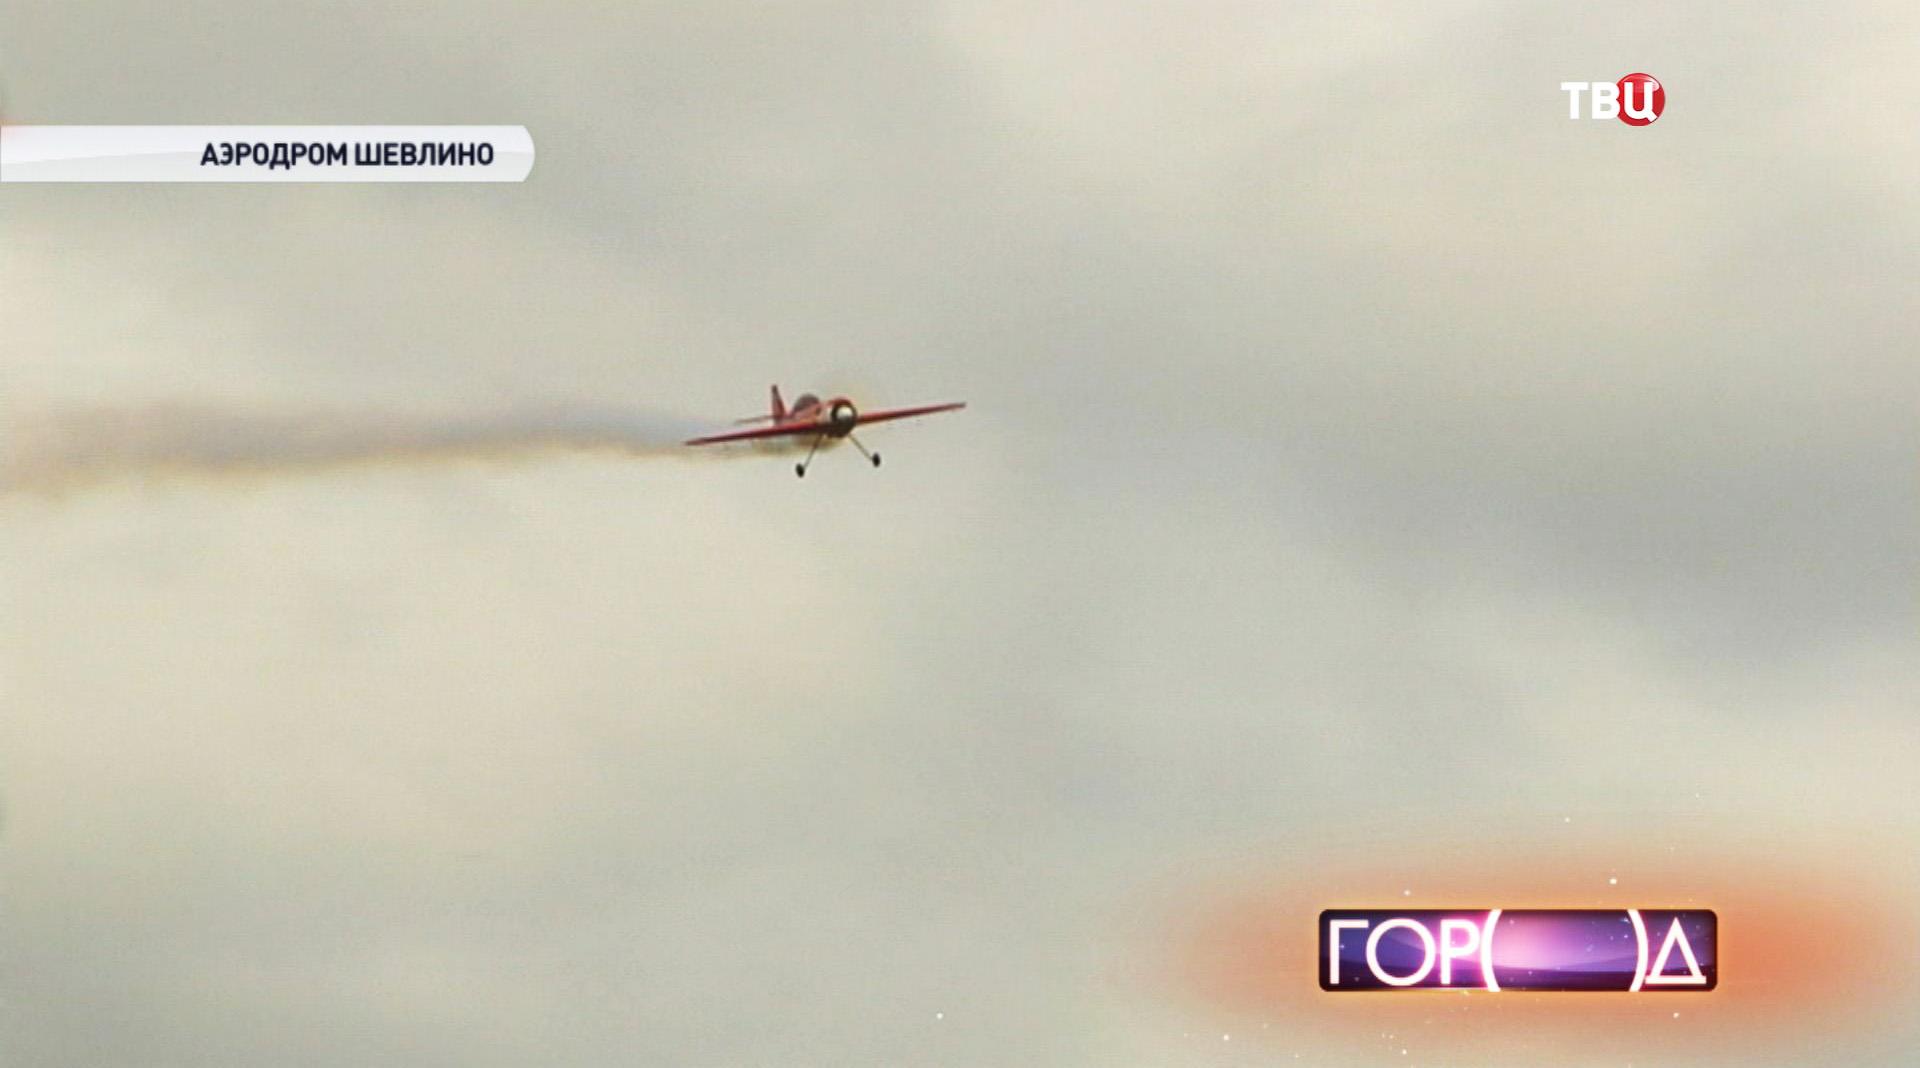 Высший пилотаж на лёгком спортивном самолёте Су-29